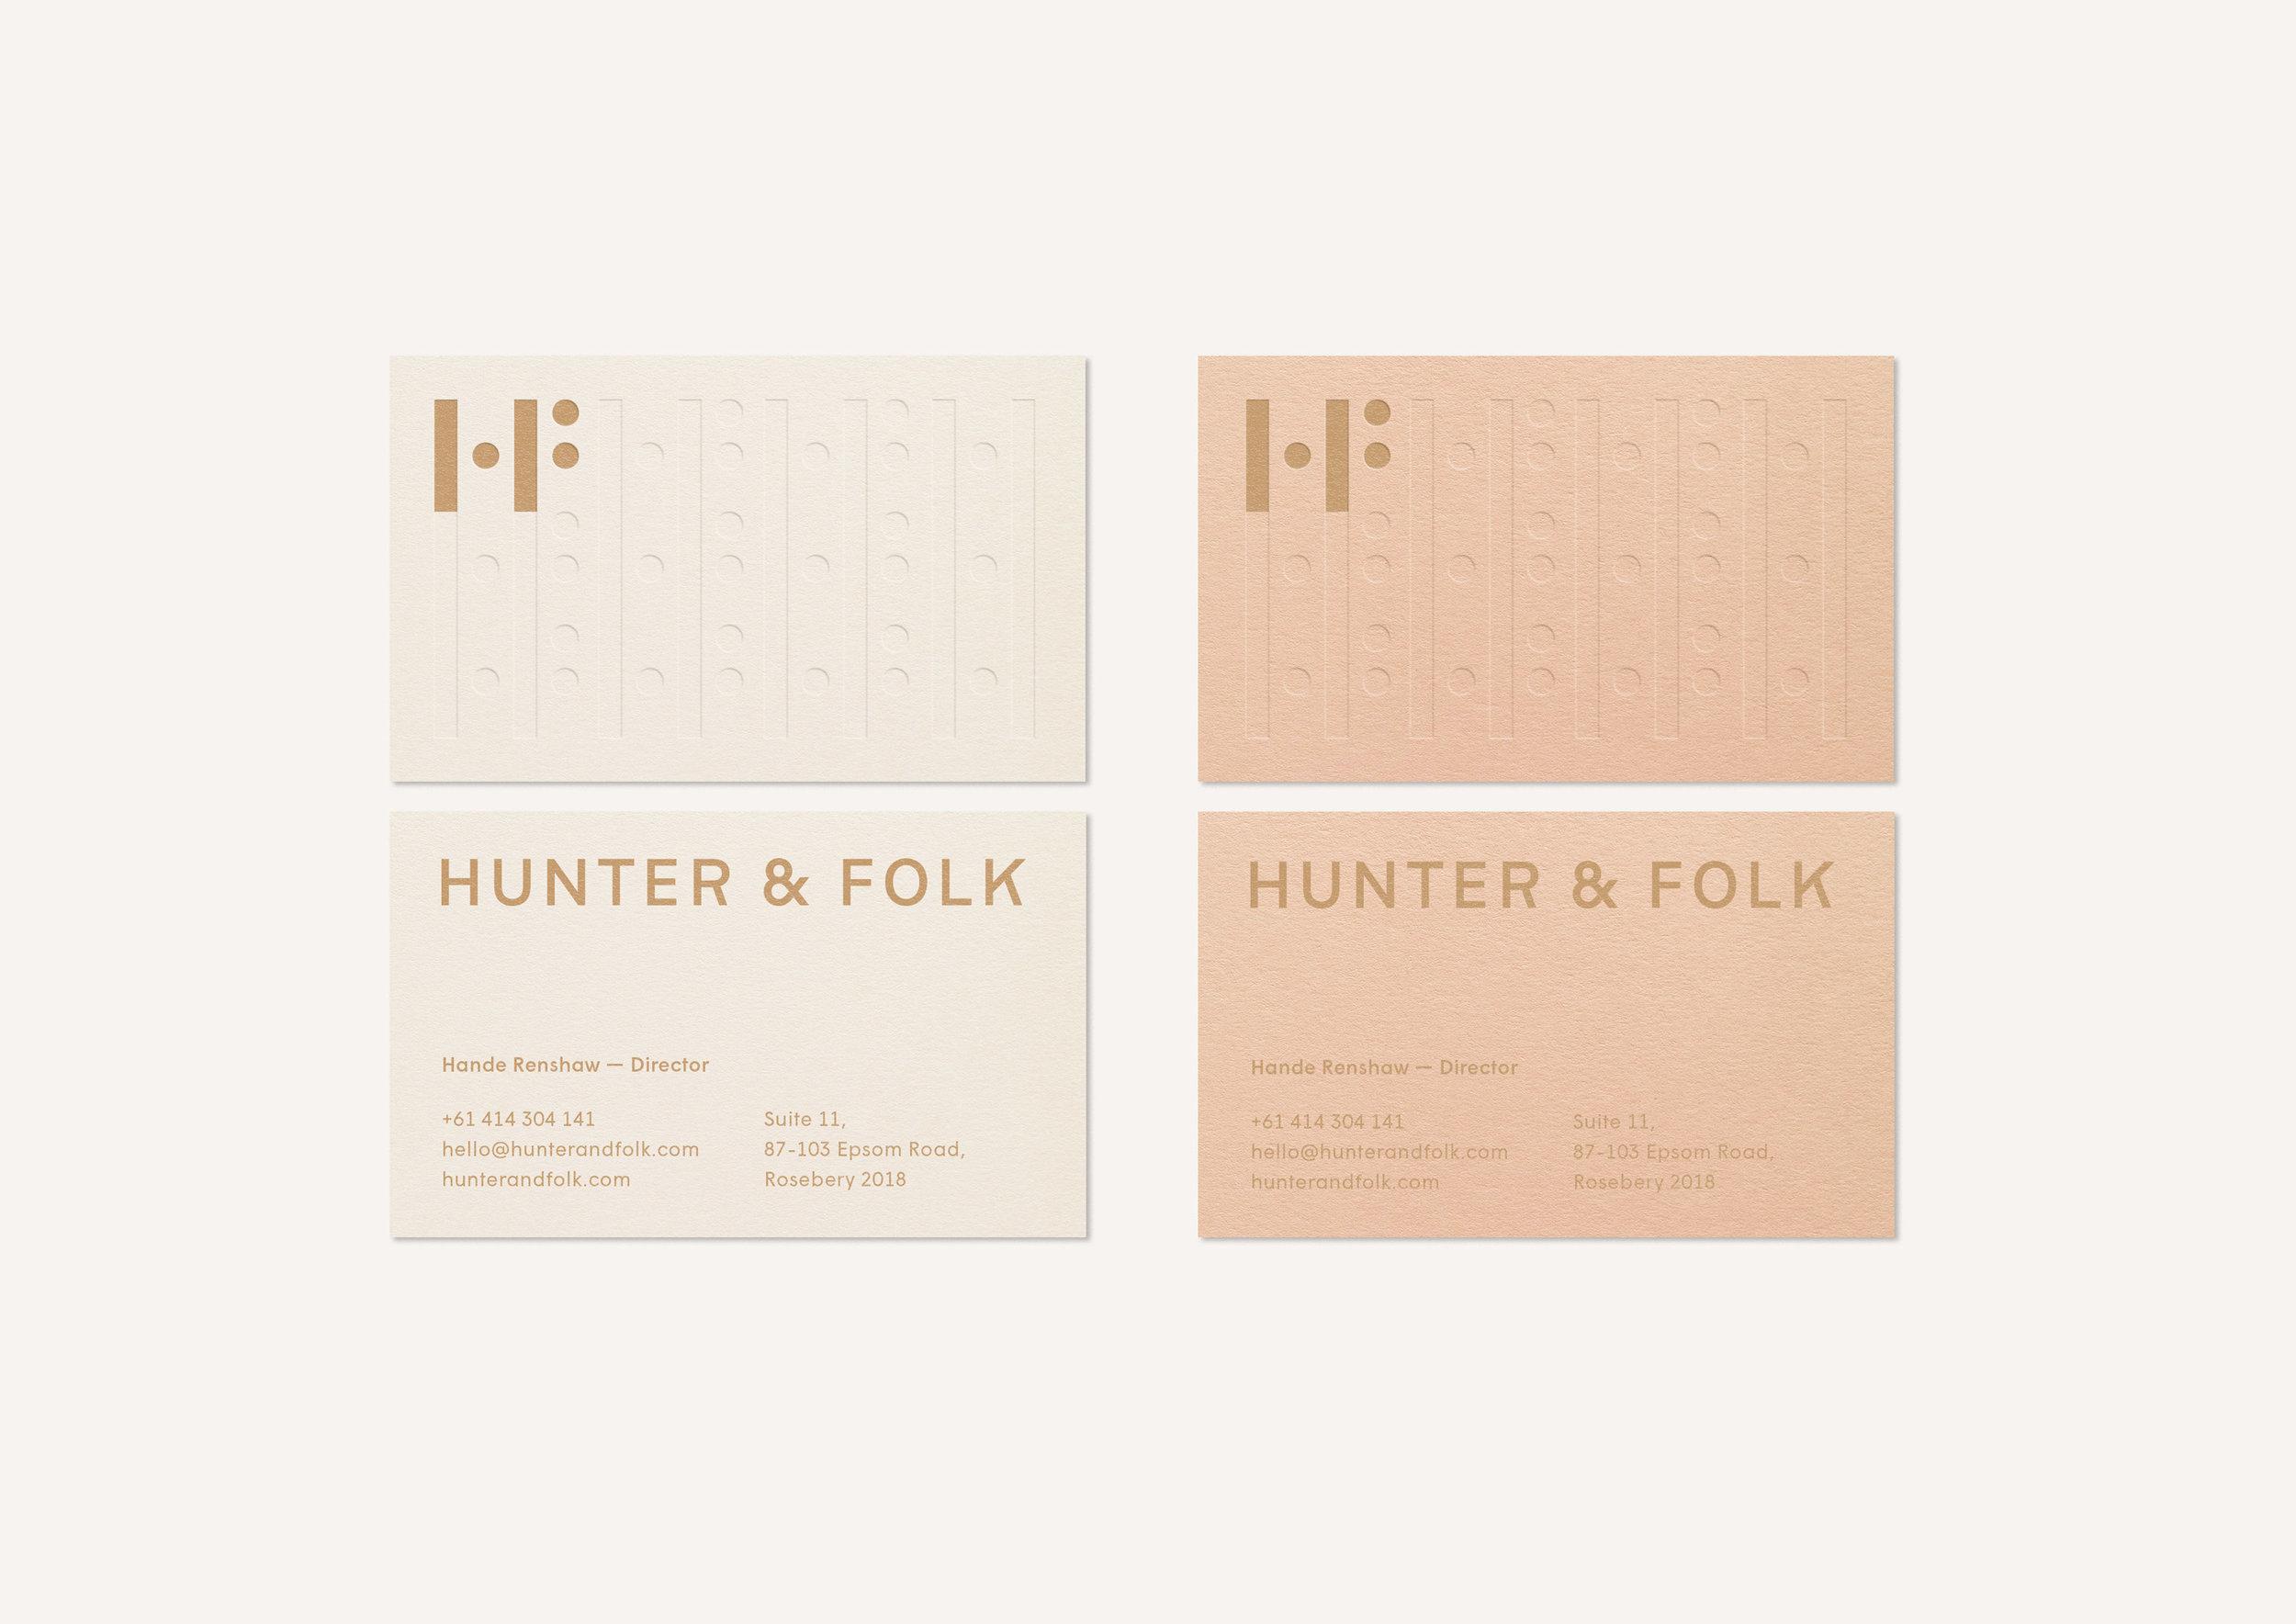 Hunter & Folk: Branding, Editorial Design, Print Collateral + Web Design